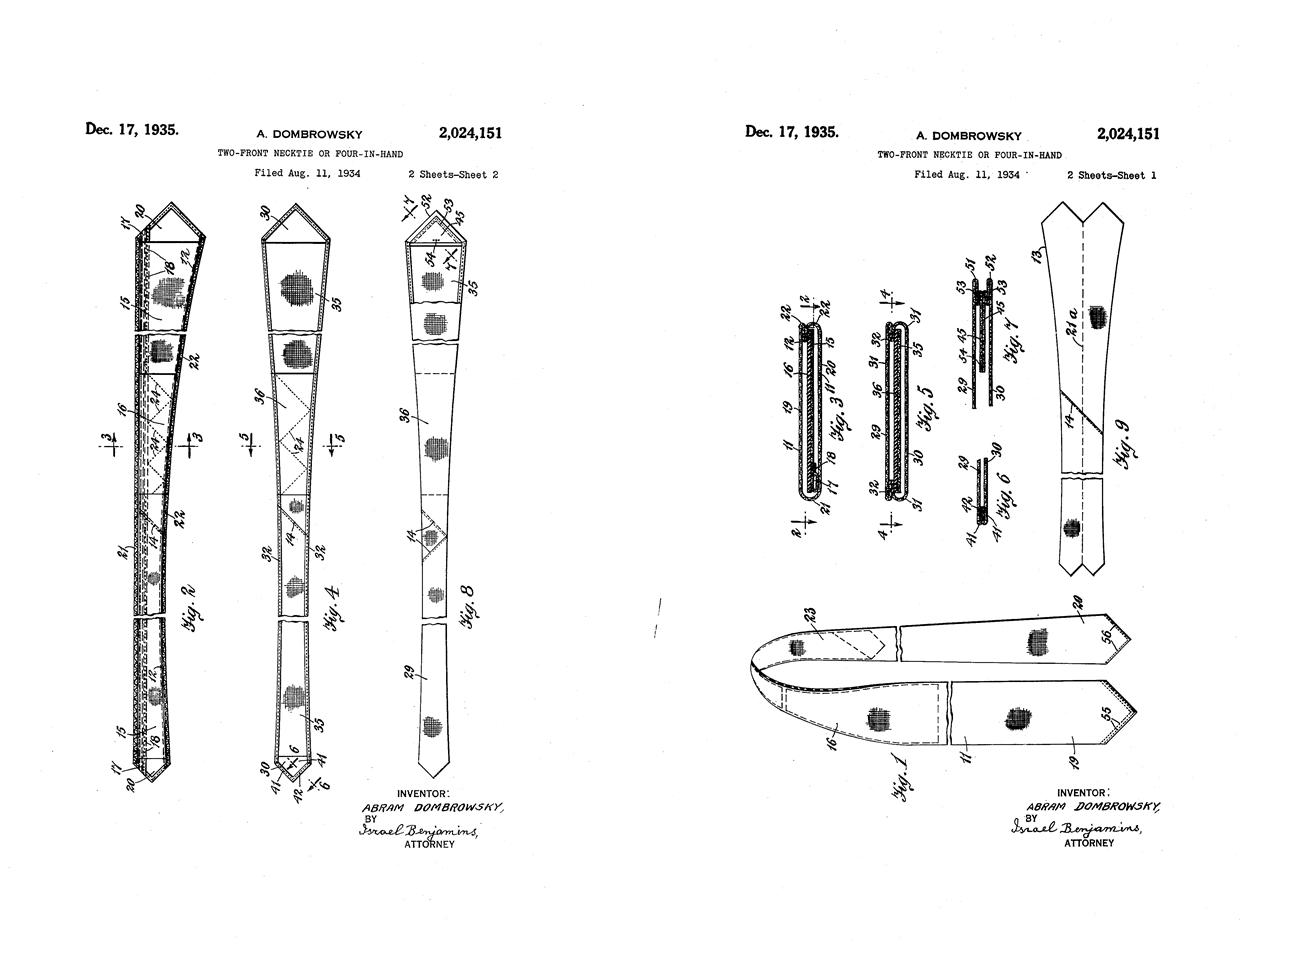 двусторонний галстук патент 1935 года